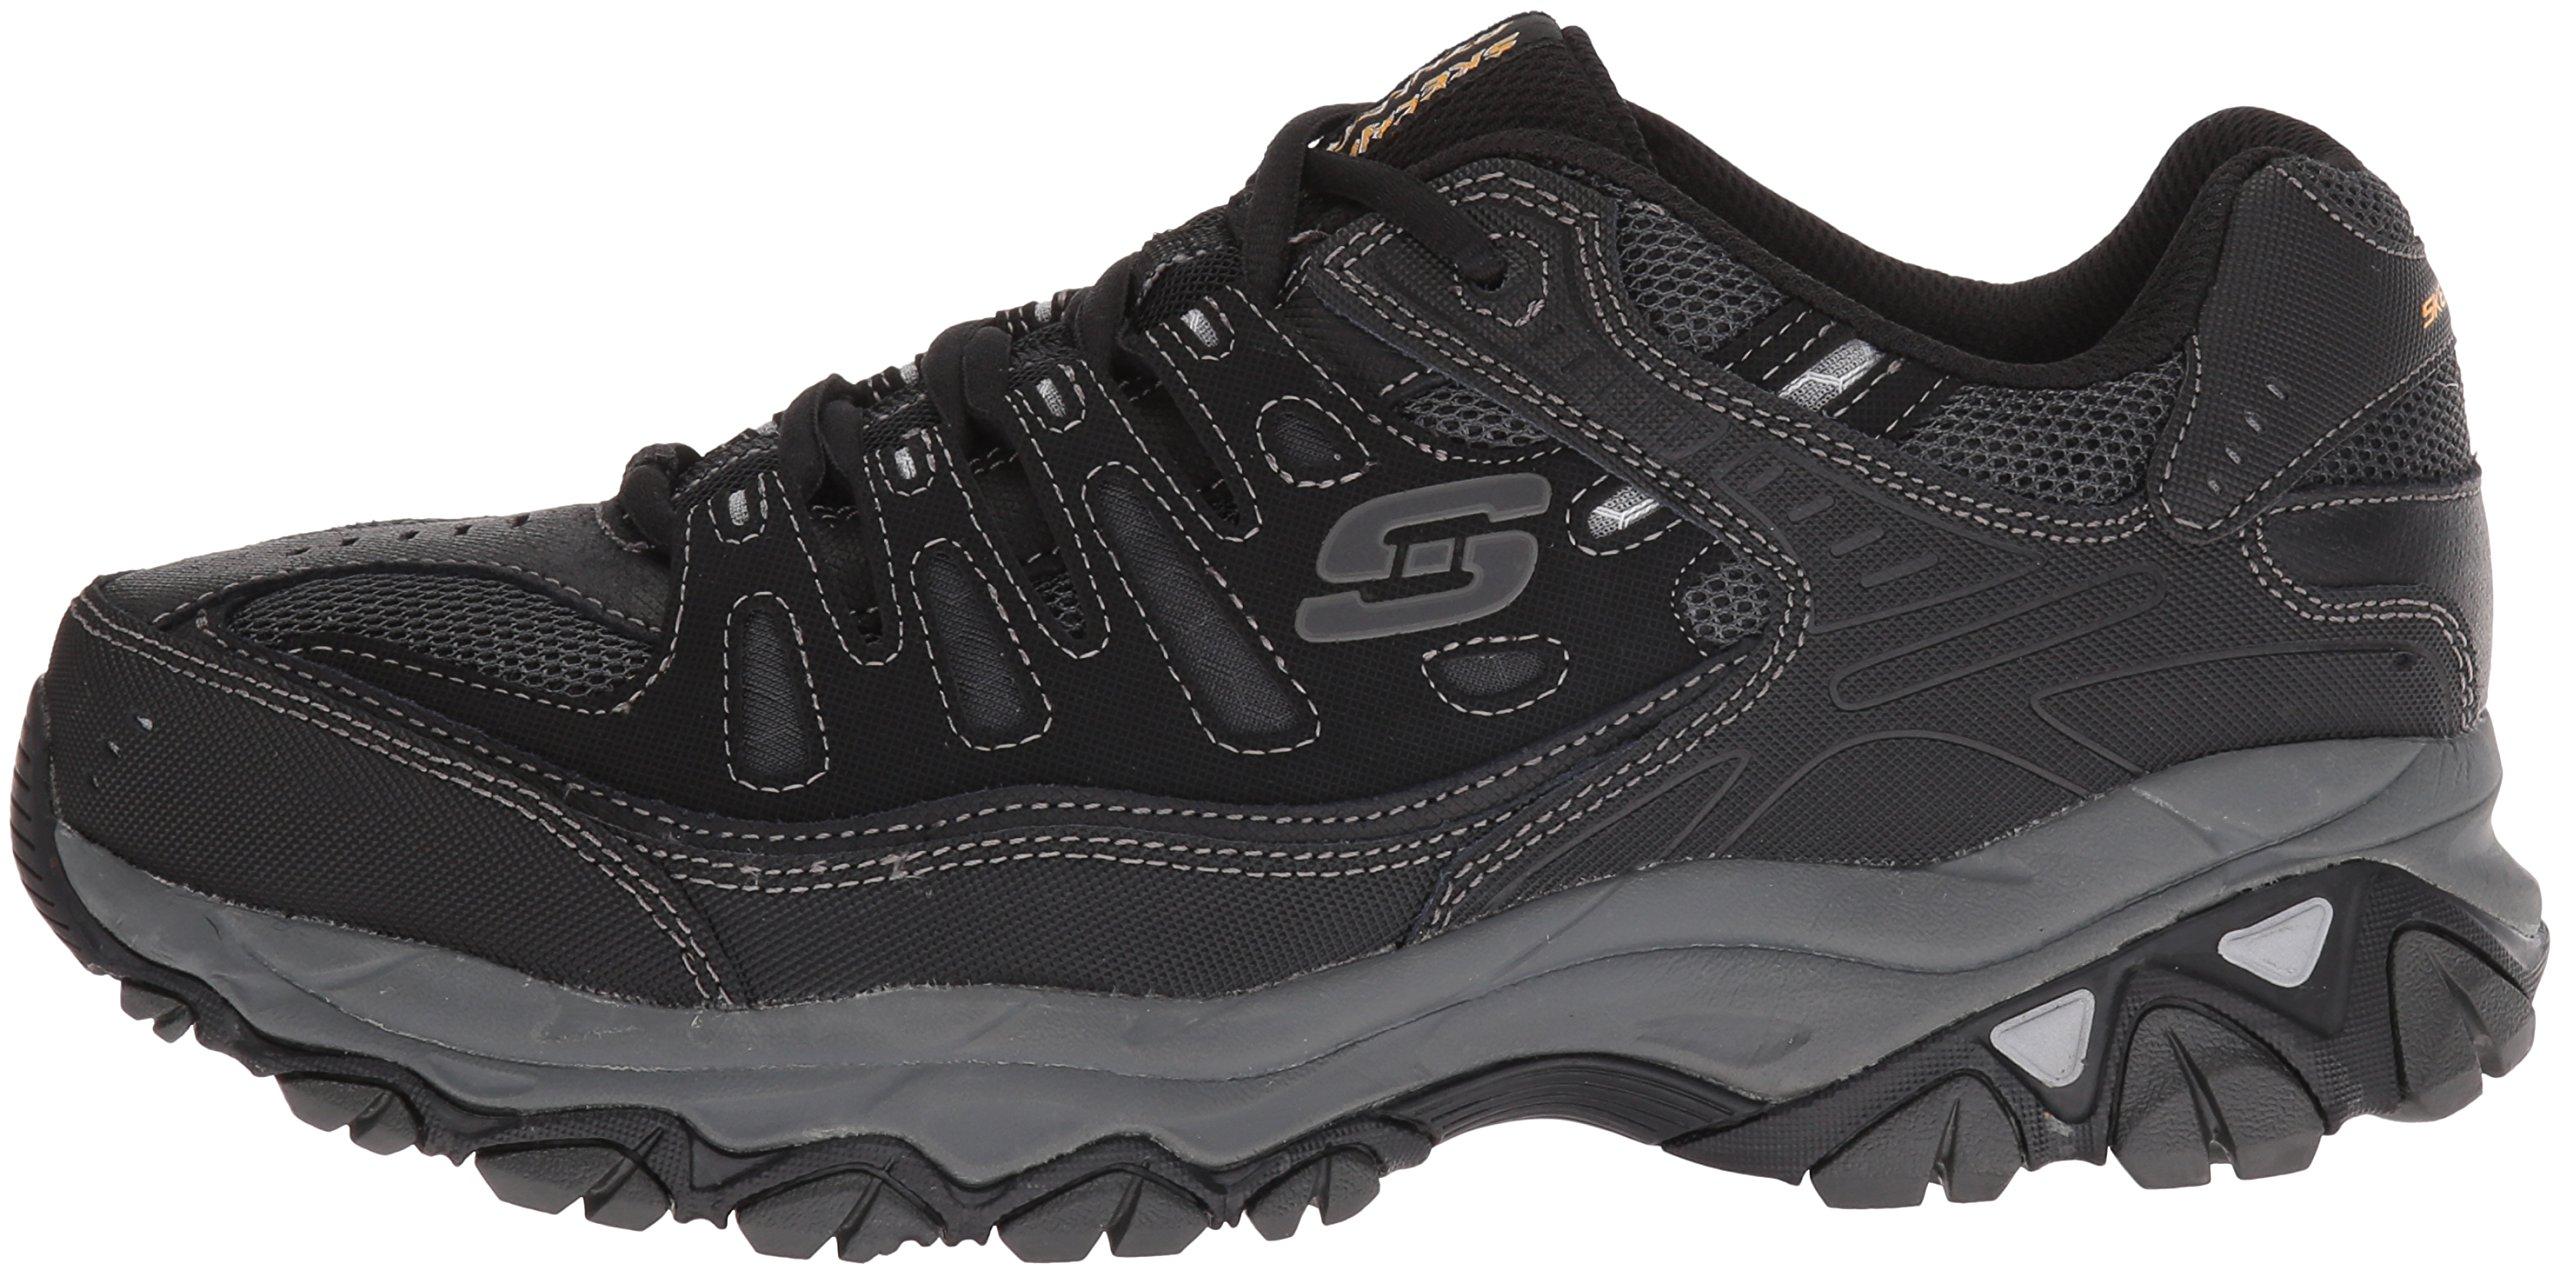 Skechers Men's AFTERBURNM.FIT Memory Foam Lace-Up Sneaker, Black, 6.5 M US by Skechers (Image #5)